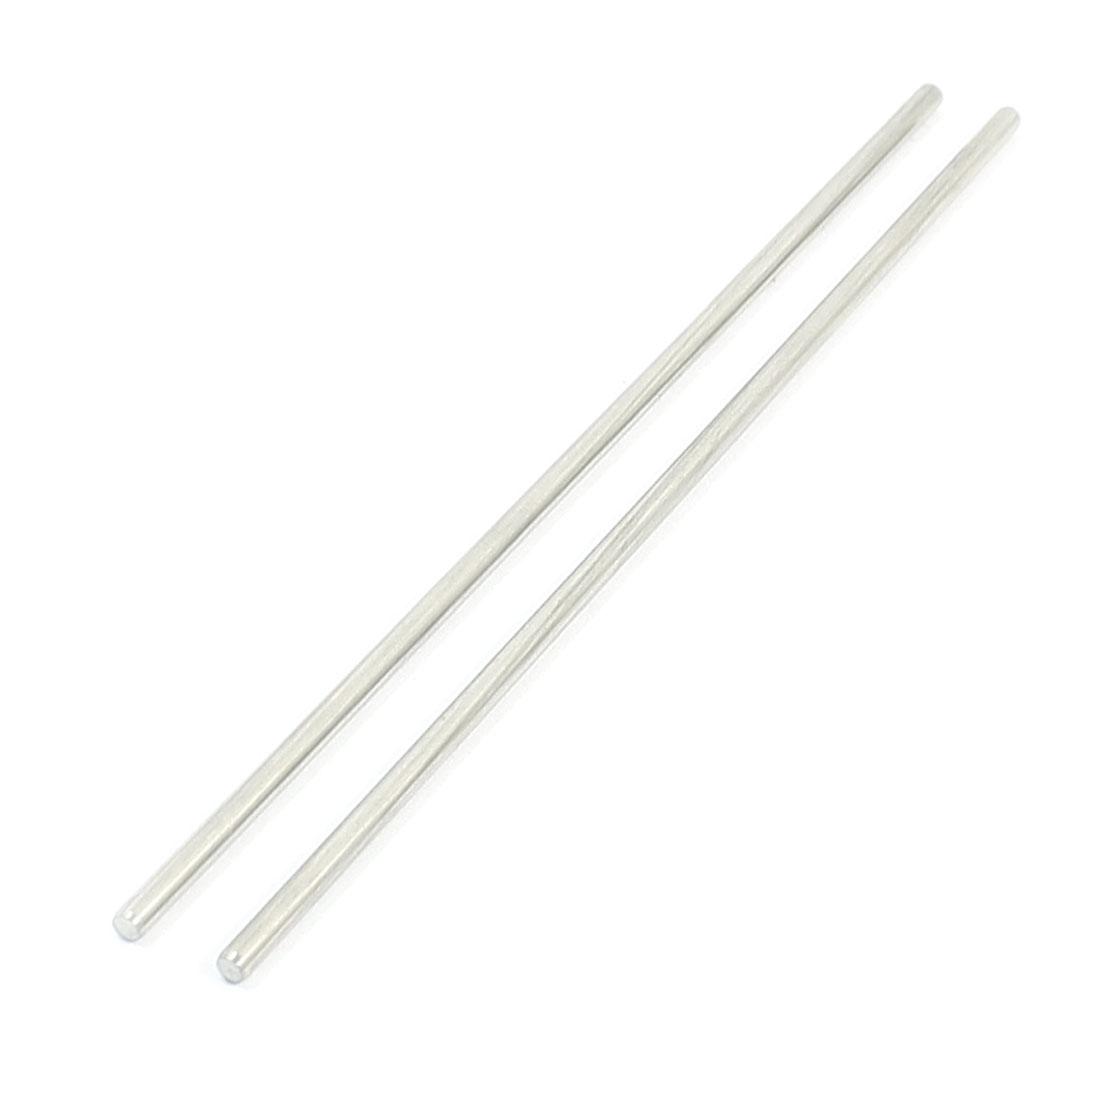 "2Pcs 2.5mm Diameter Stainless Steel Motion Axle Circular Round Rod Bar 4.7"" Long"